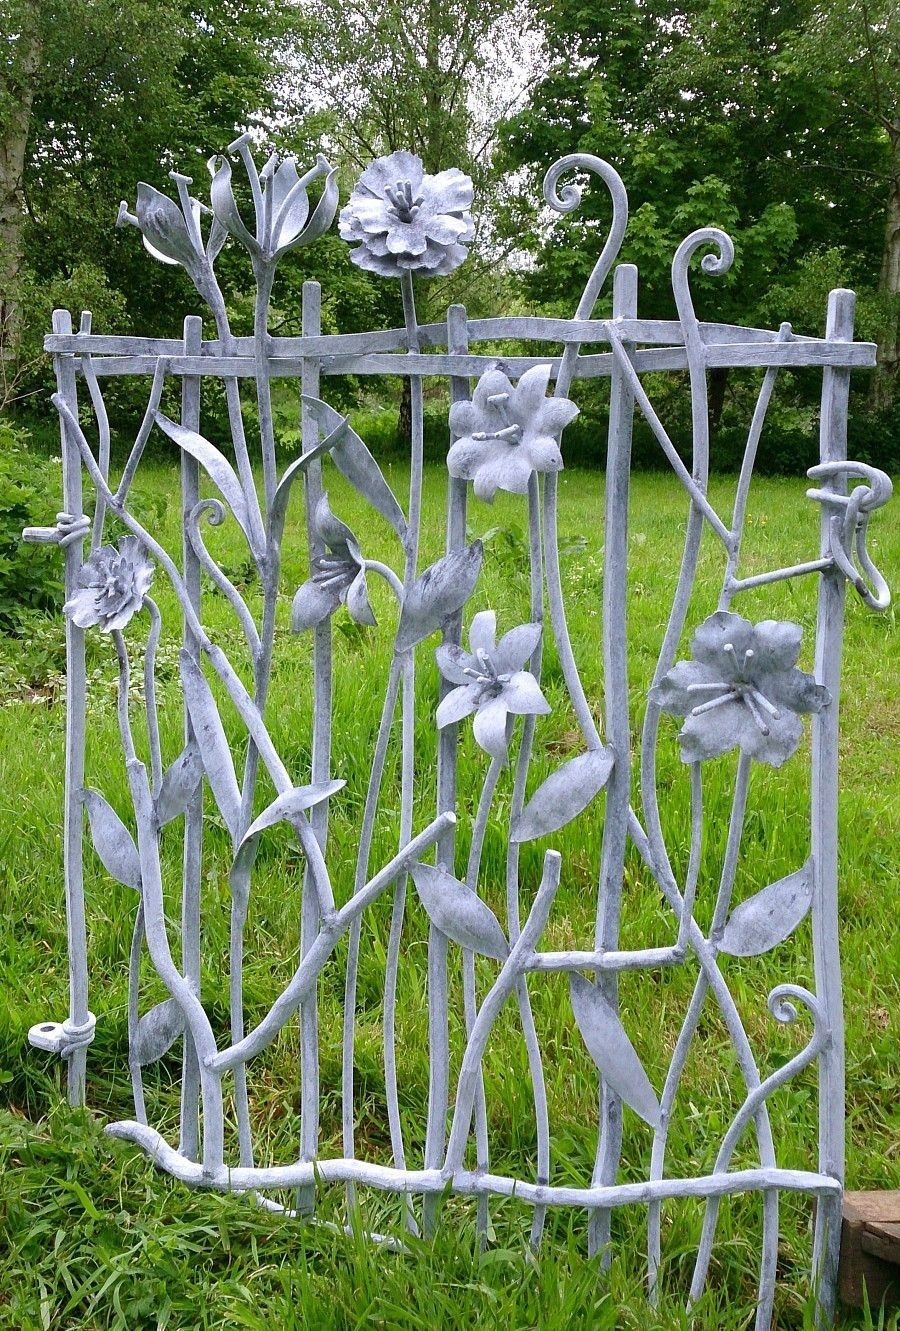 Inspiring Outdoor Metal Design Ideas For Garden Art You Must Try27